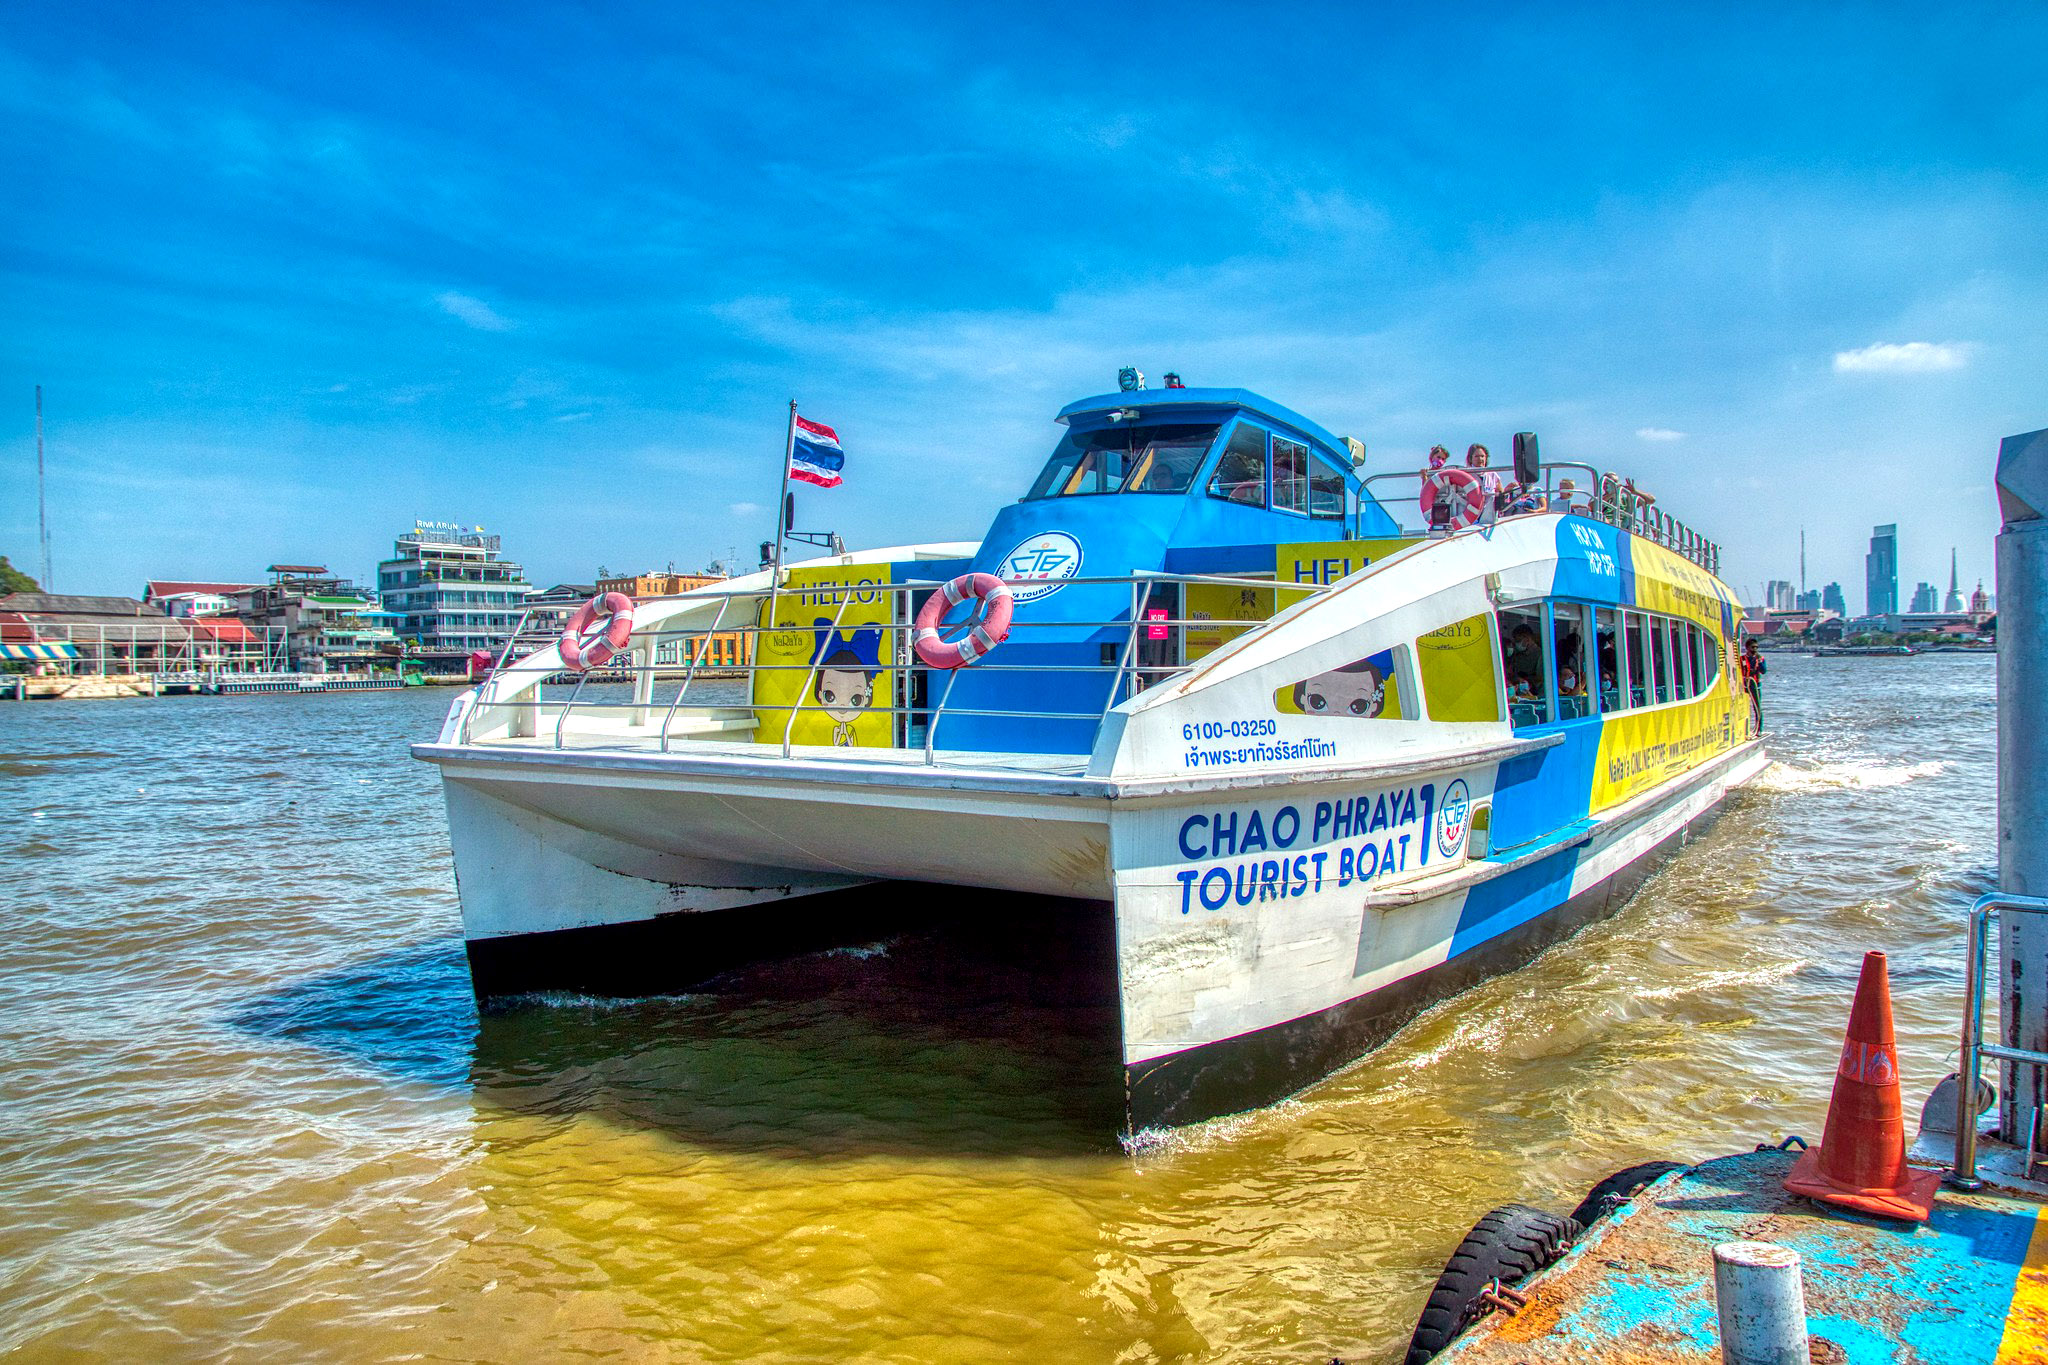 Catamaran tourist boat on the Chao Phraya rive by Uwe Schwarzbach.jpg